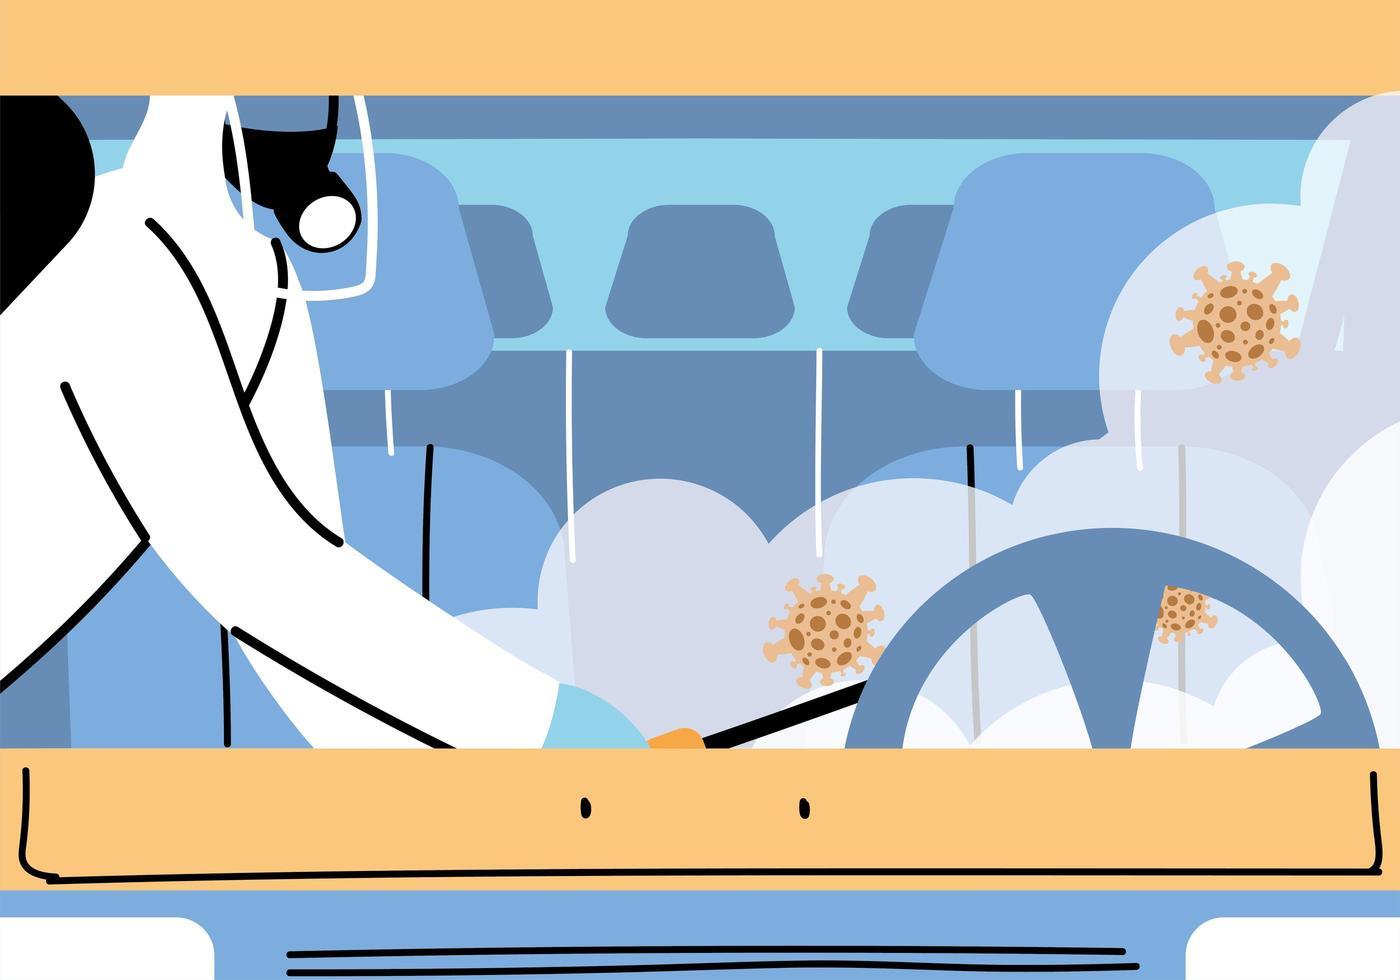 Desinfección de vehículos de servicio de coronavirus o covid 19 vector